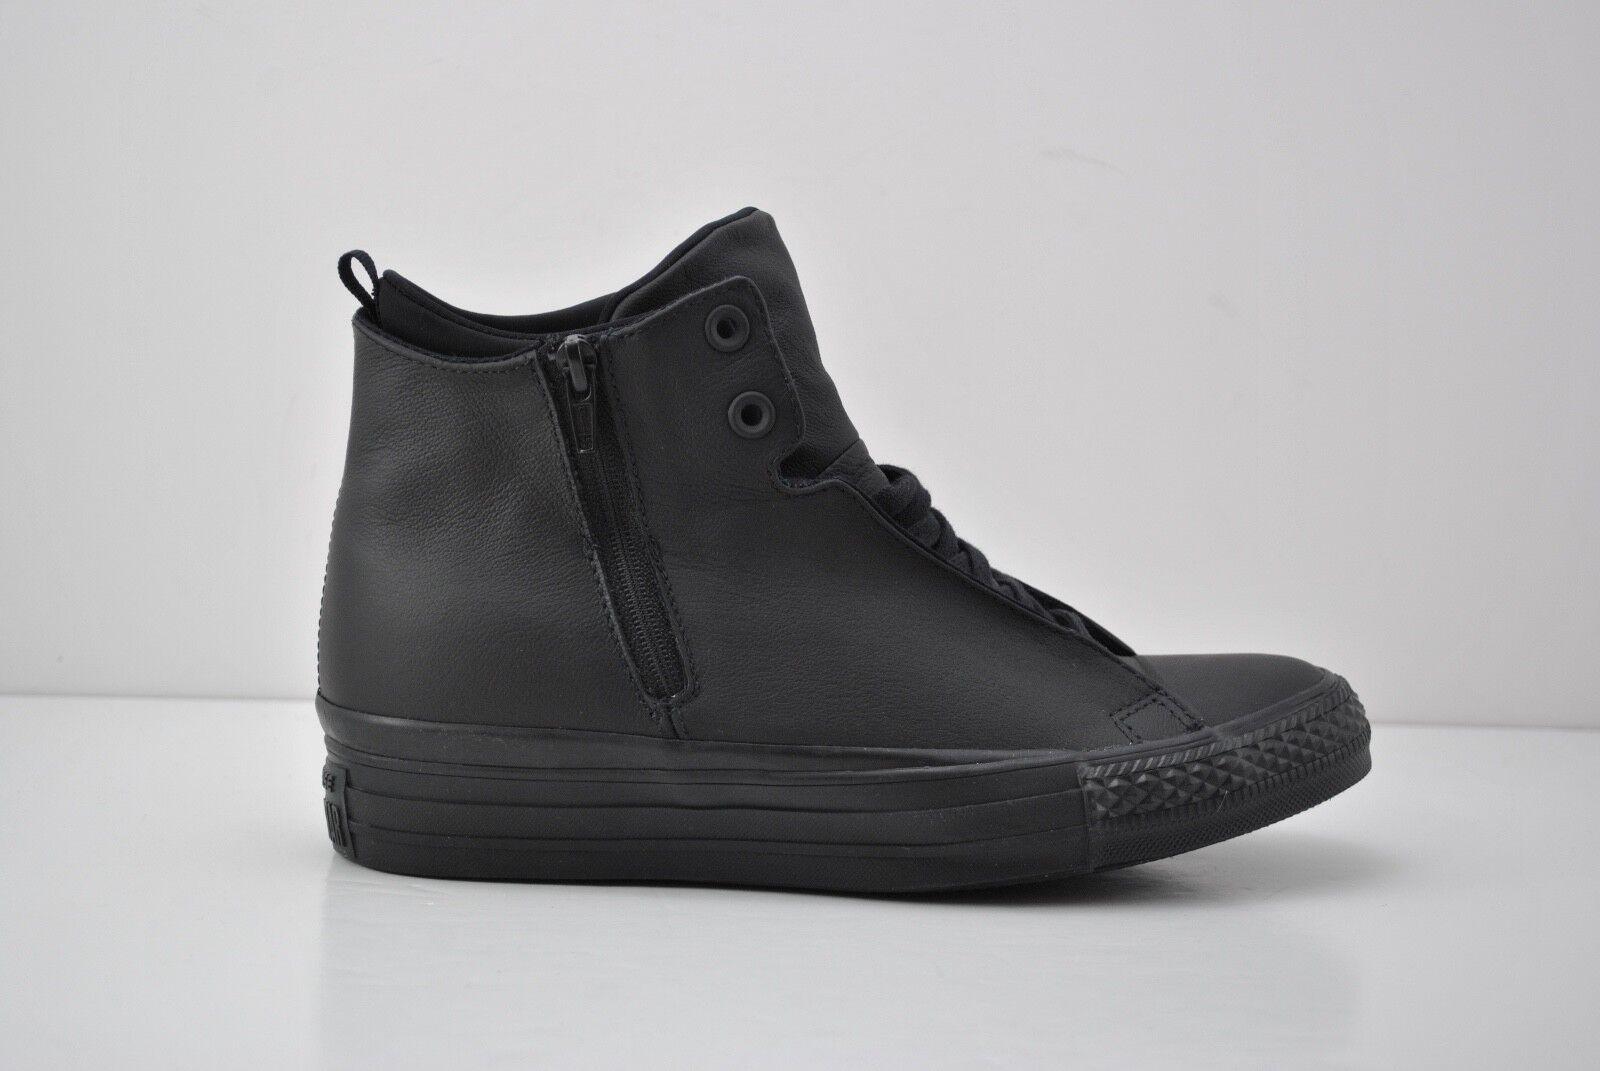 Womens Converse Chuck Taylor All Star Hi Top Shoes Size 6 Black 553326C Selene